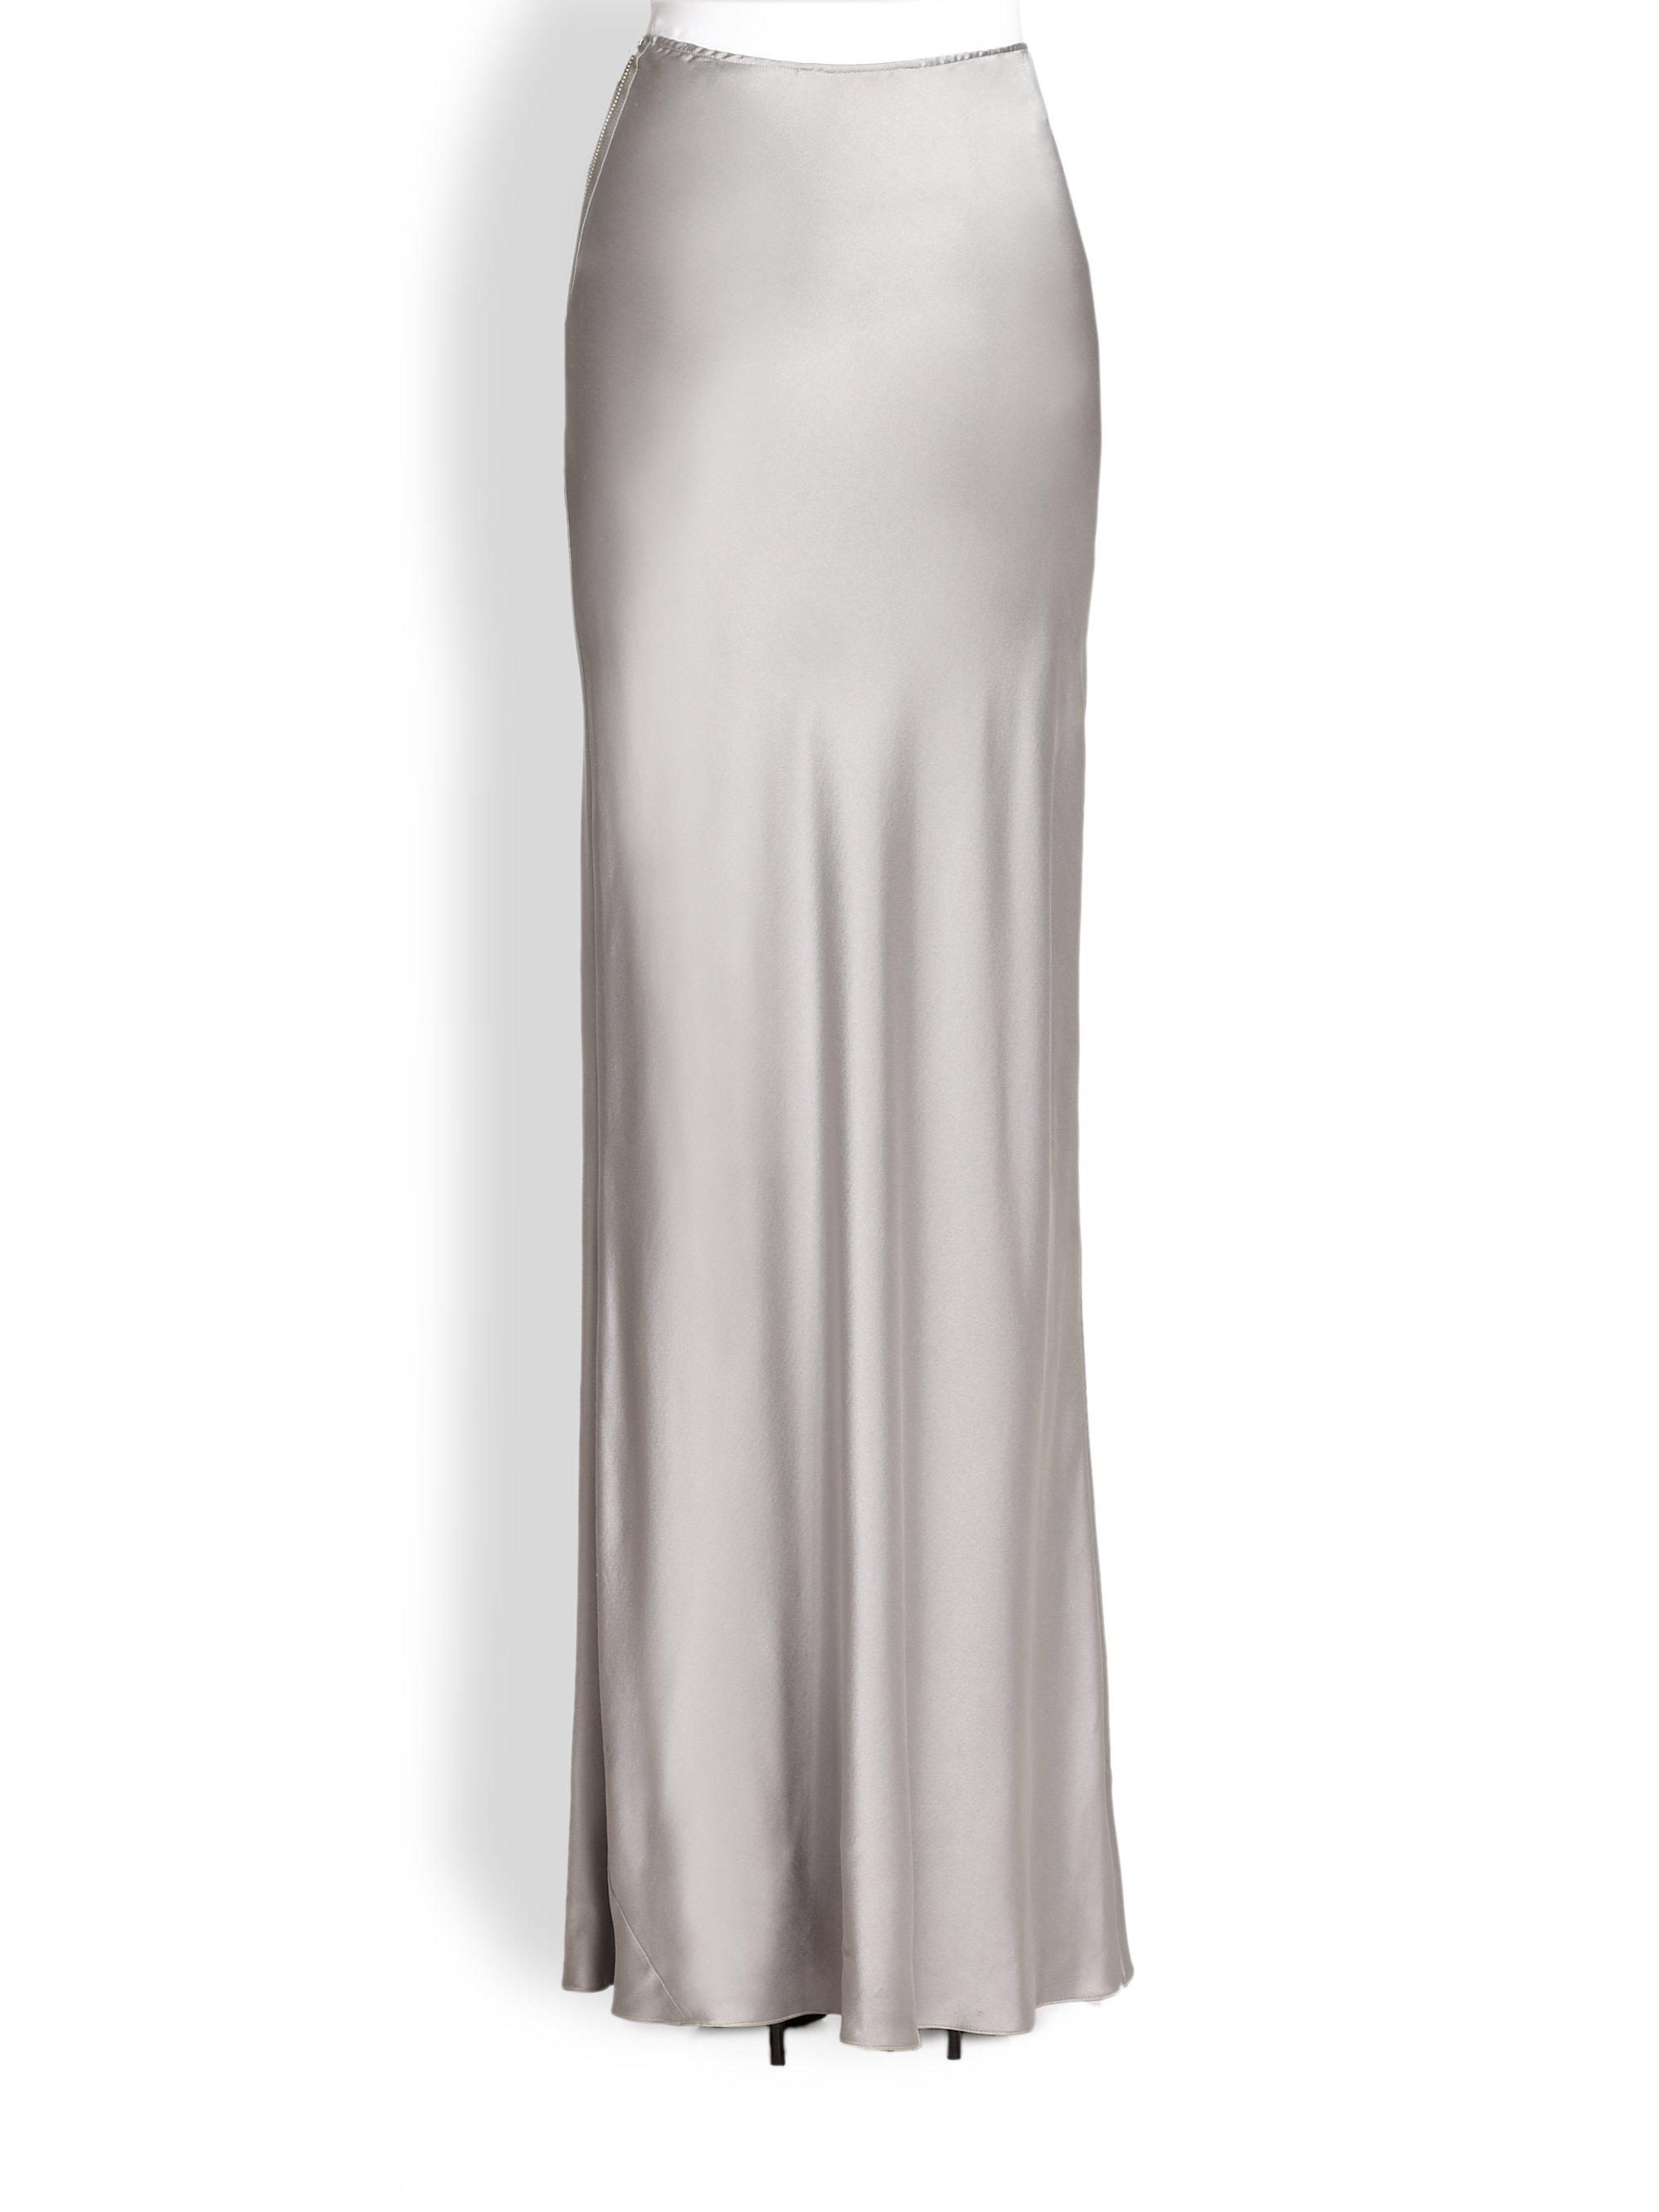 Tess giberson Long Silk Skirt in Metallic | Lyst